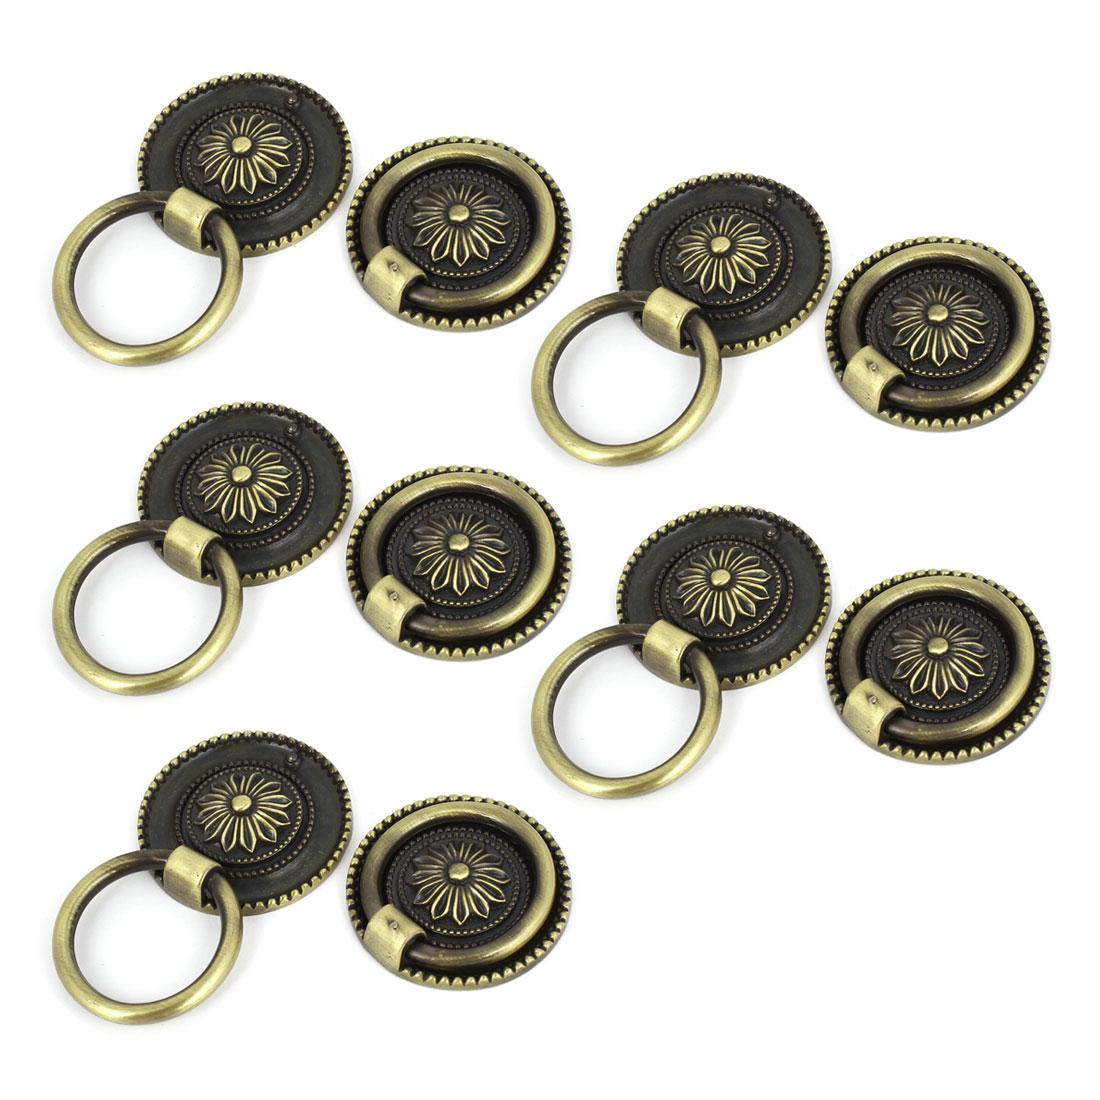 "10 Pcs Bronze Tone Flower Pattern 1.8"" Diameter Metal Ring Furniture Door Pull Handle"